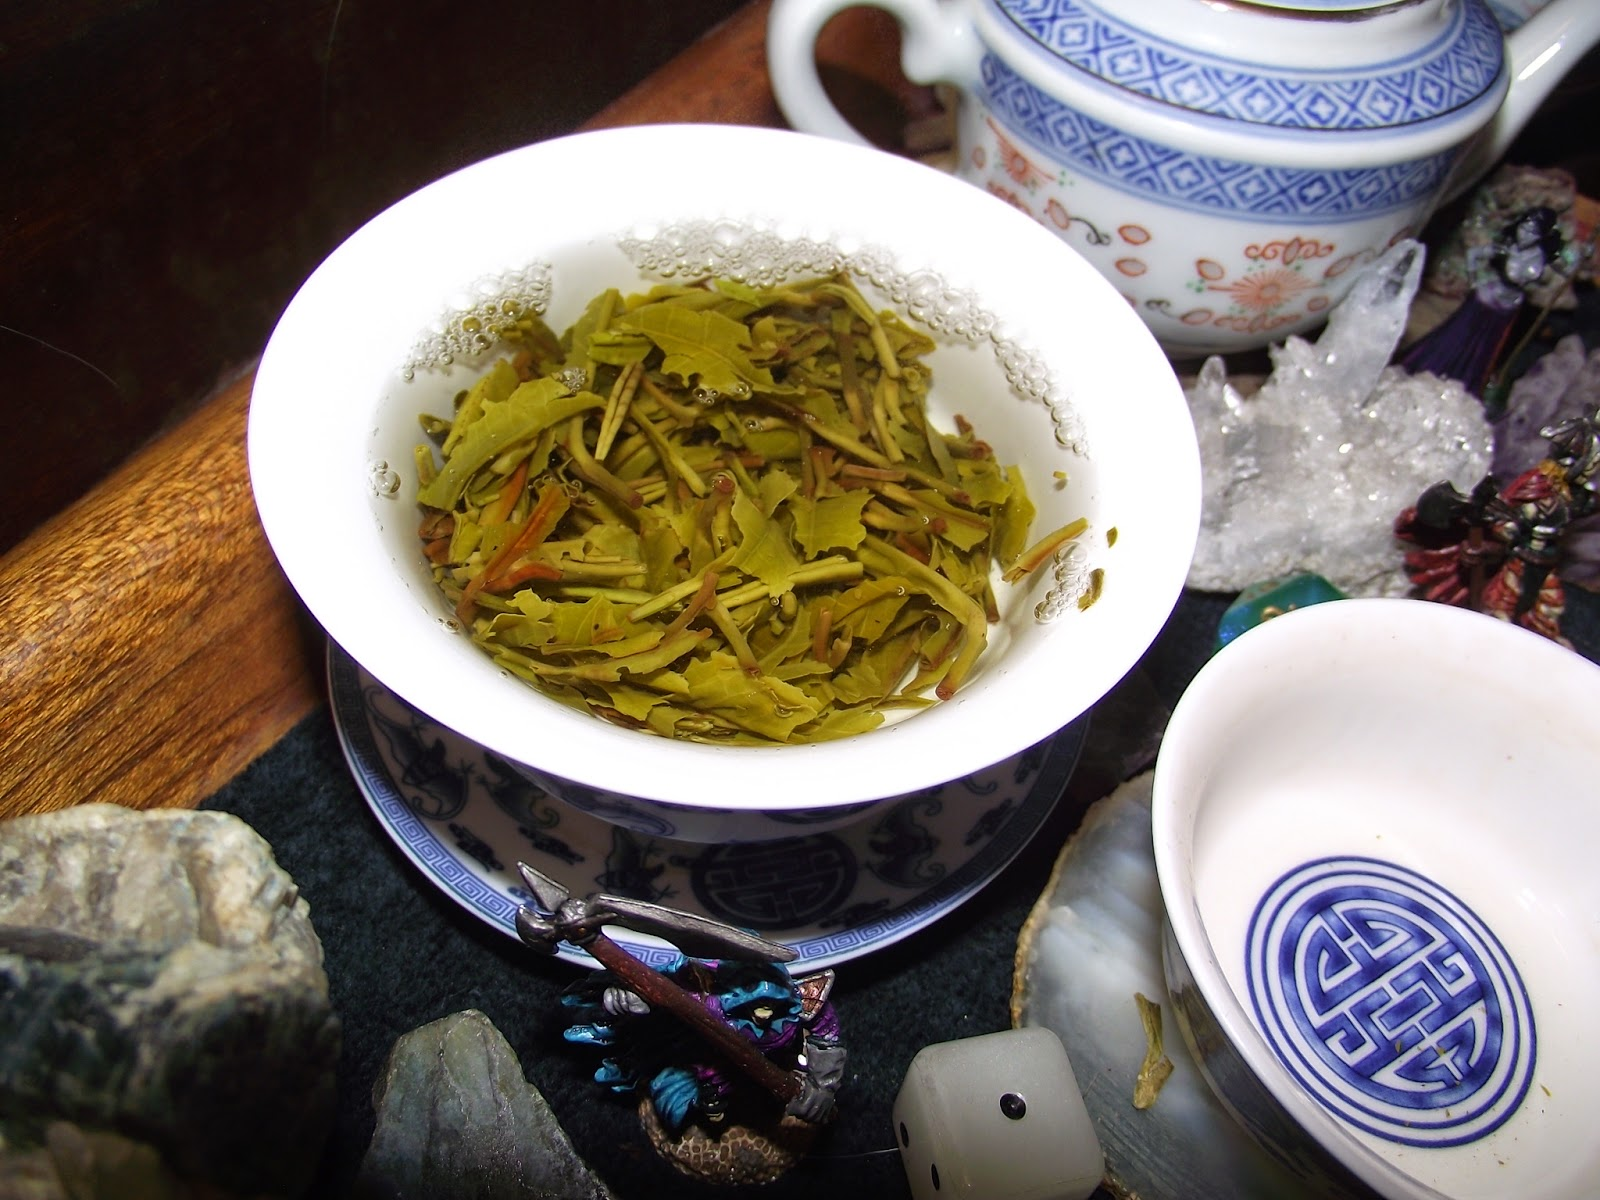 billimalia nilgiri white tea